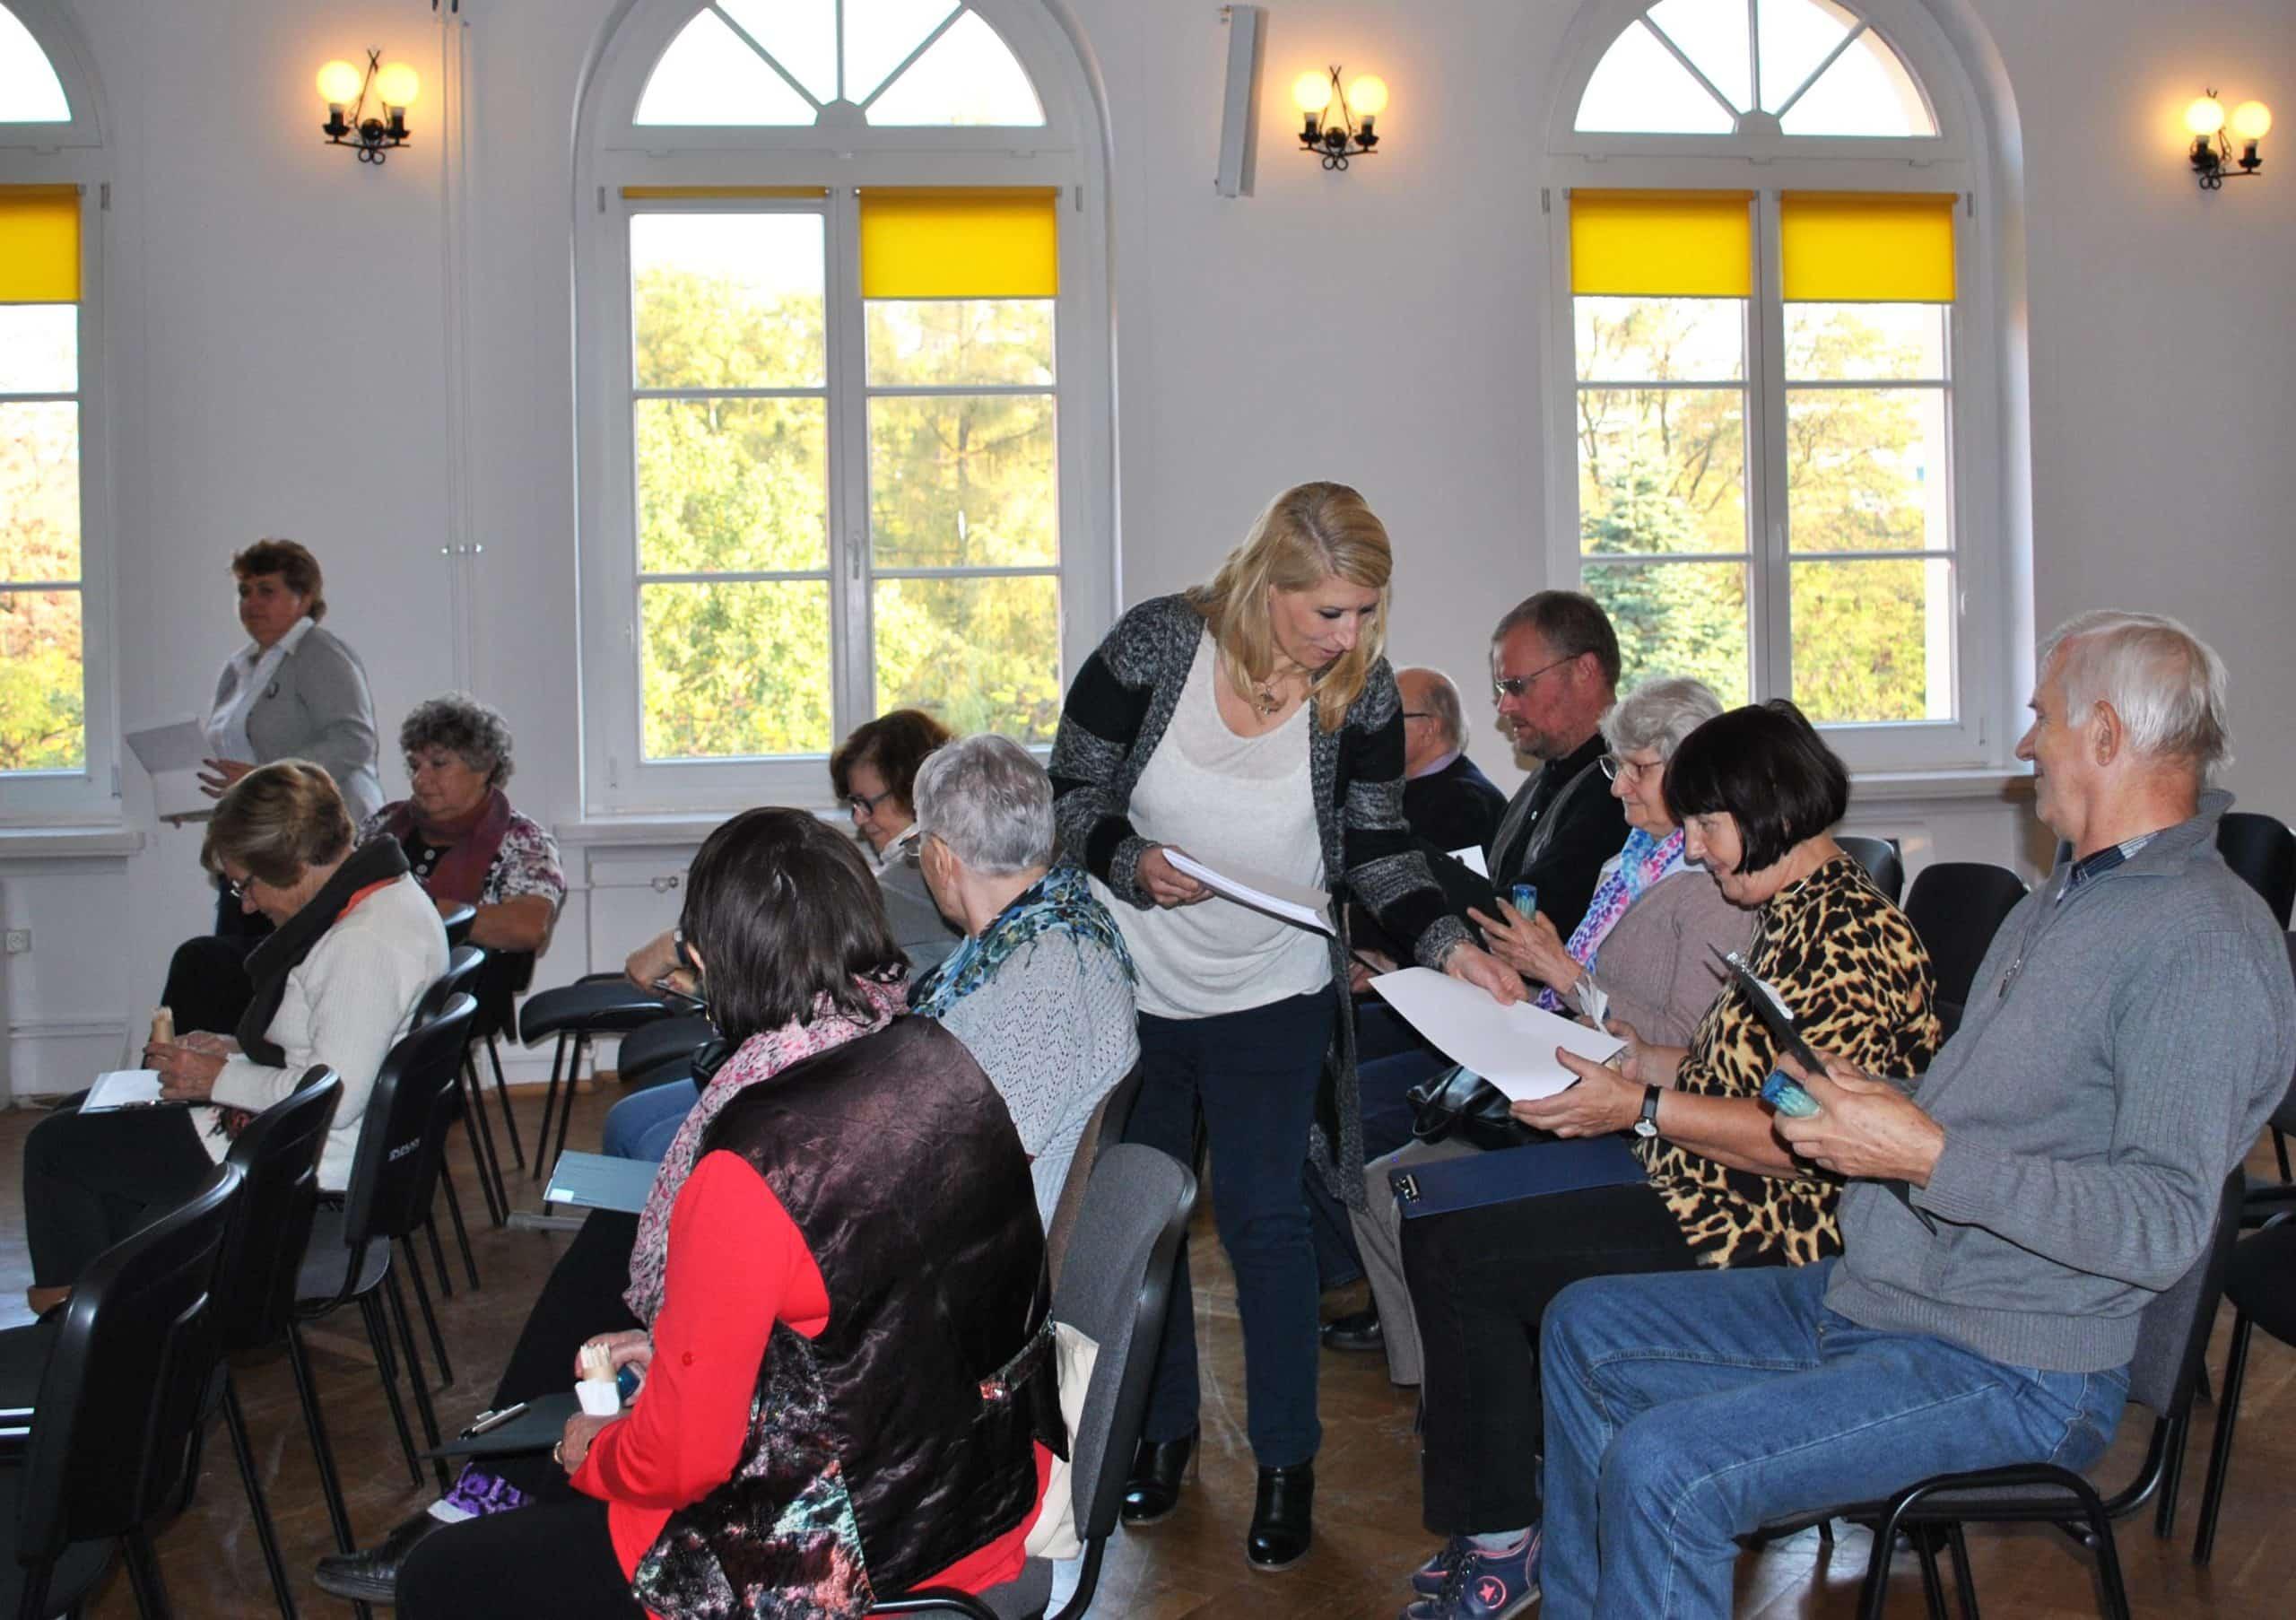 27.10.15_INTEGRAC WARSZTATY_fot 4 Joanna Ryłko